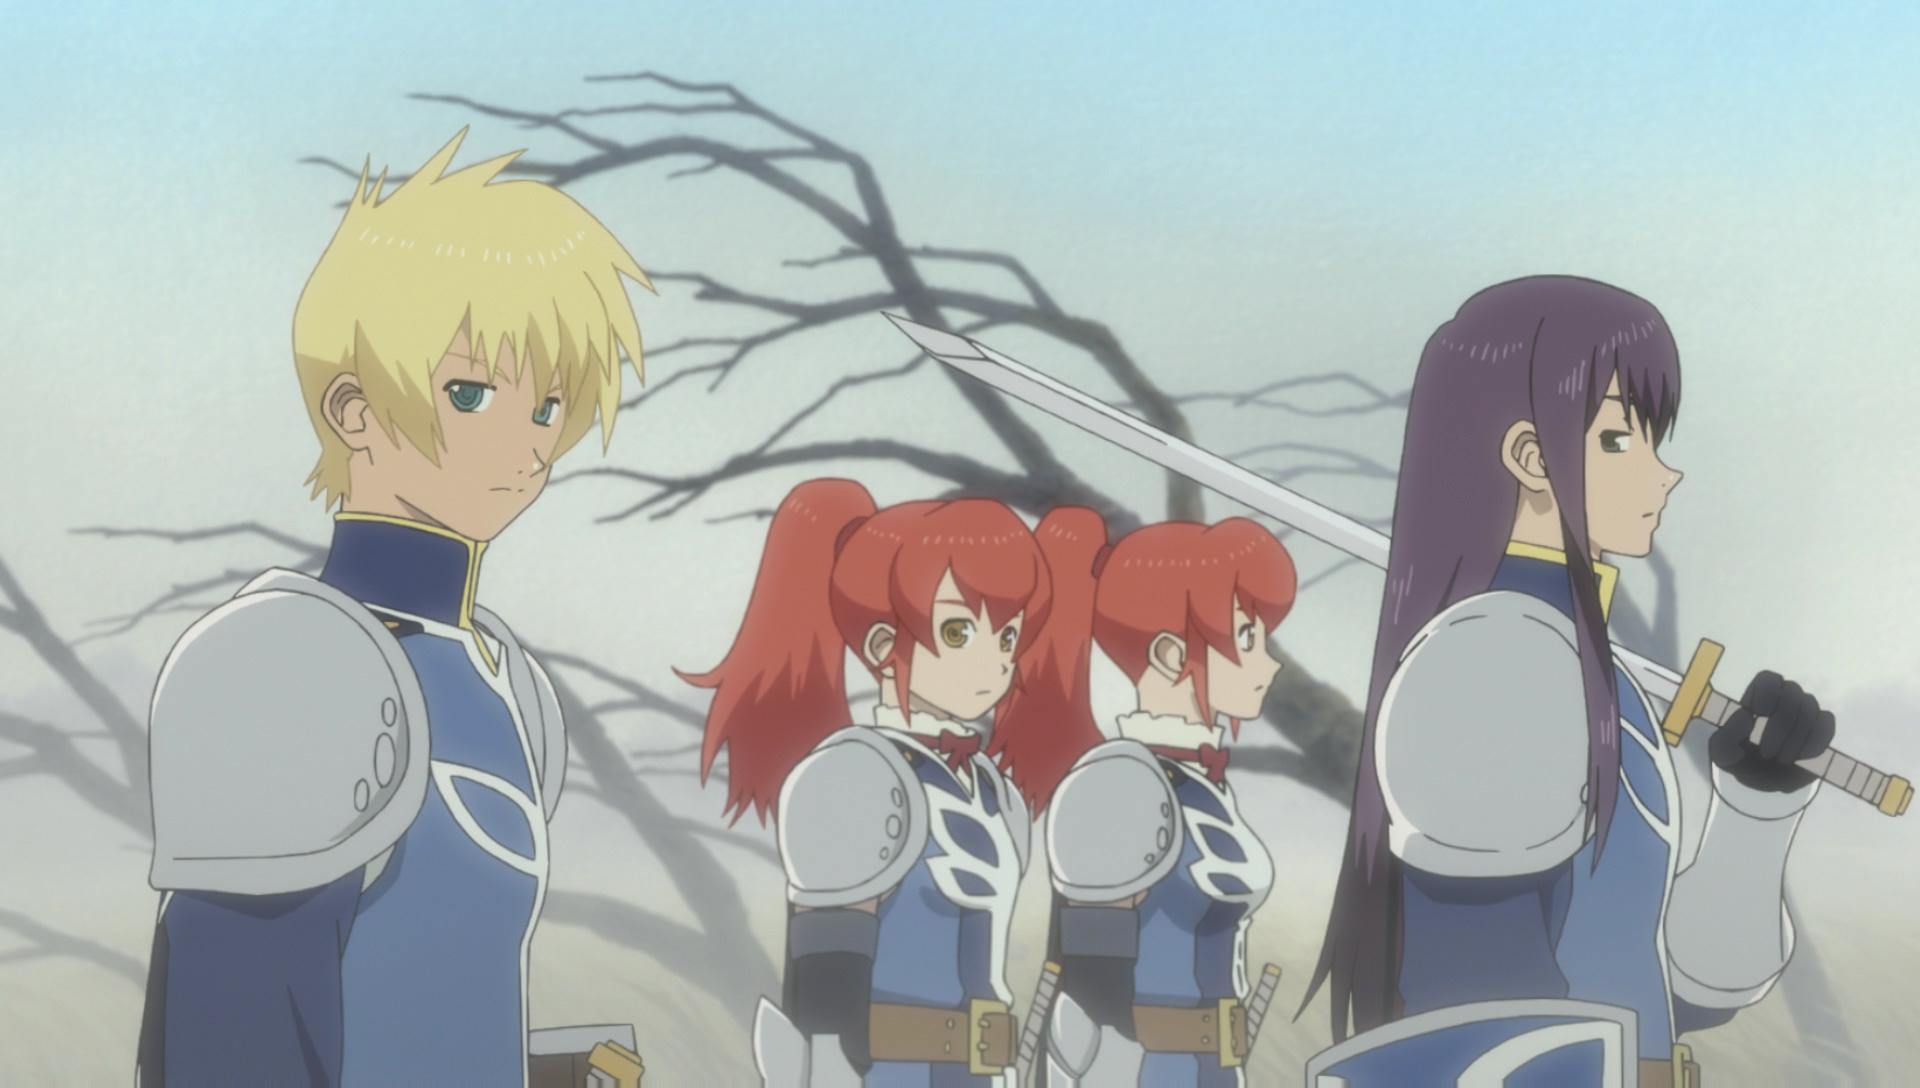 Watch Tales Of Vesperia Season 1 Sub Dub Anime Uncut Funimation